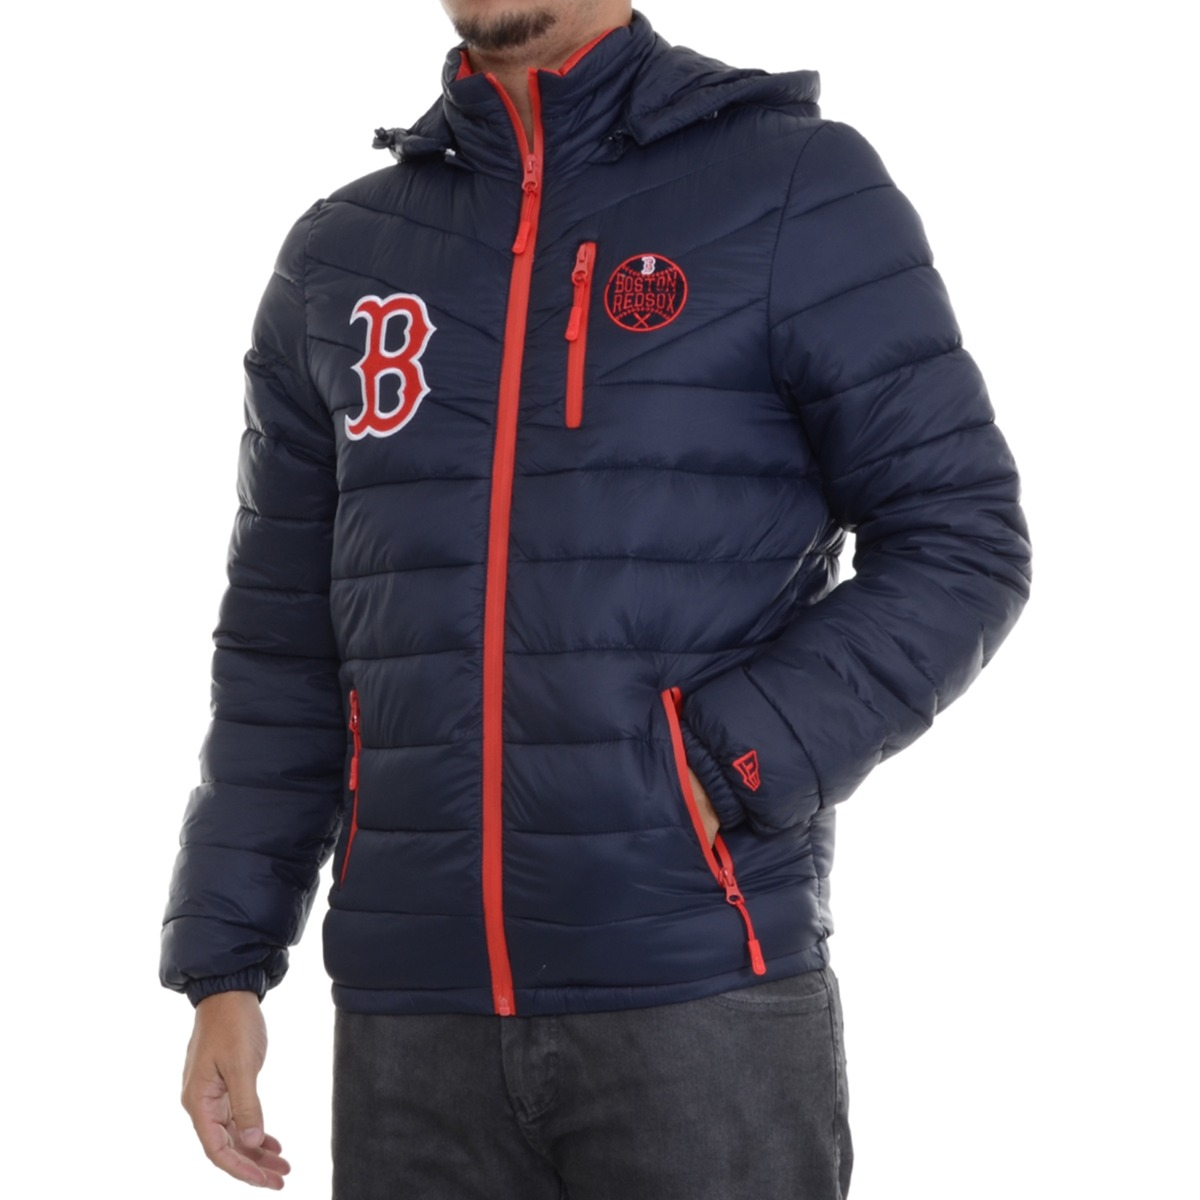 b473646b67f48 jaqueta masculina new era split pocket boston redsox marinho. Carregando  zoom.